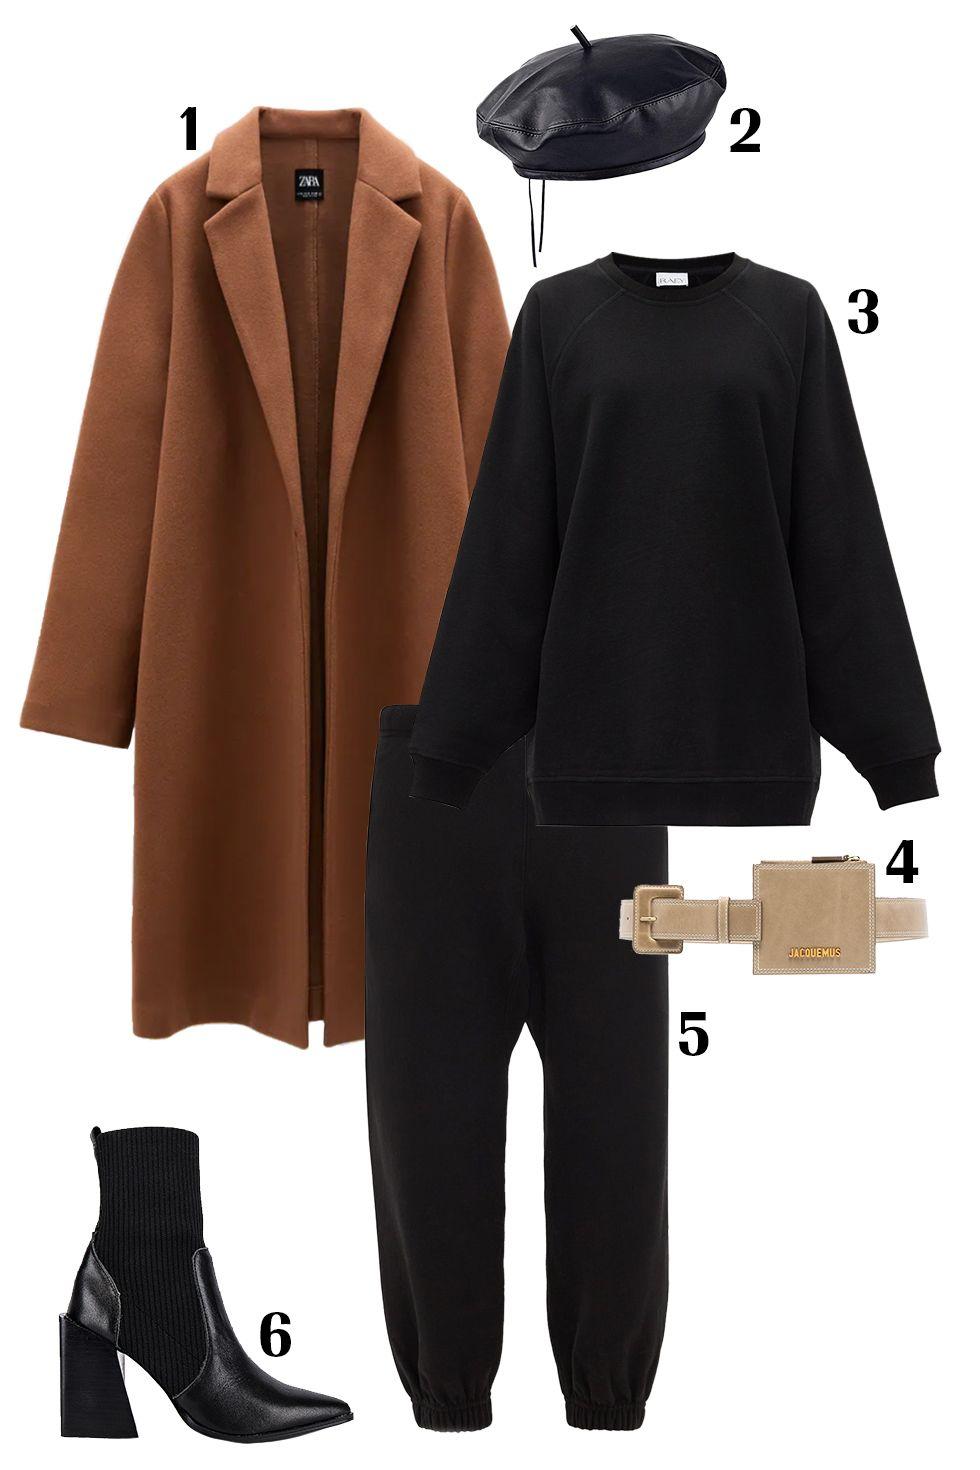 Quần nỉ + trench coat: